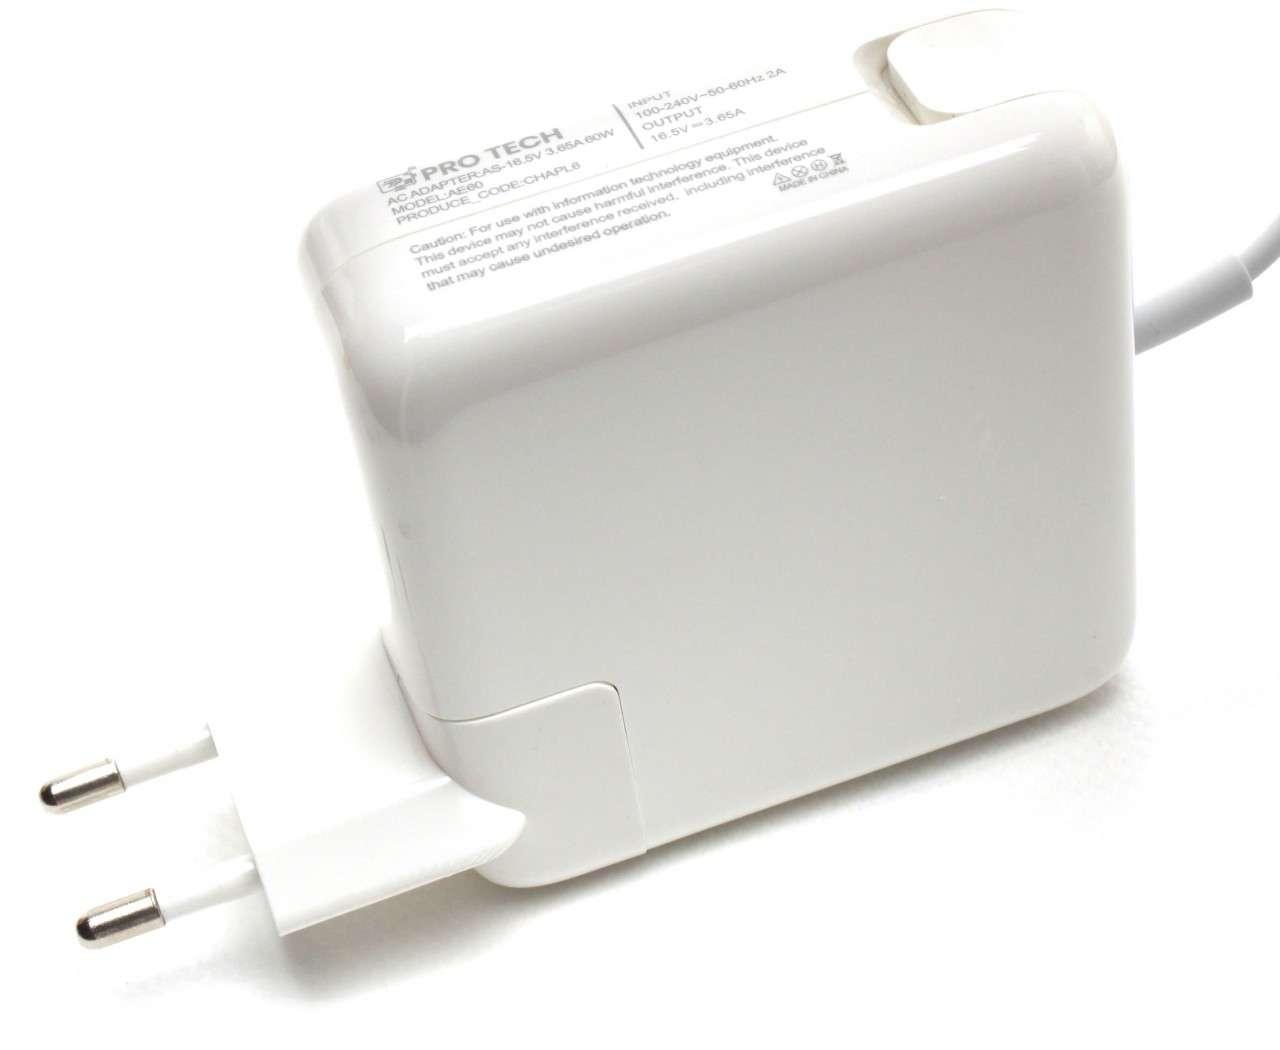 Incarcator Apple MacBook MA538LLA Replacement imagine